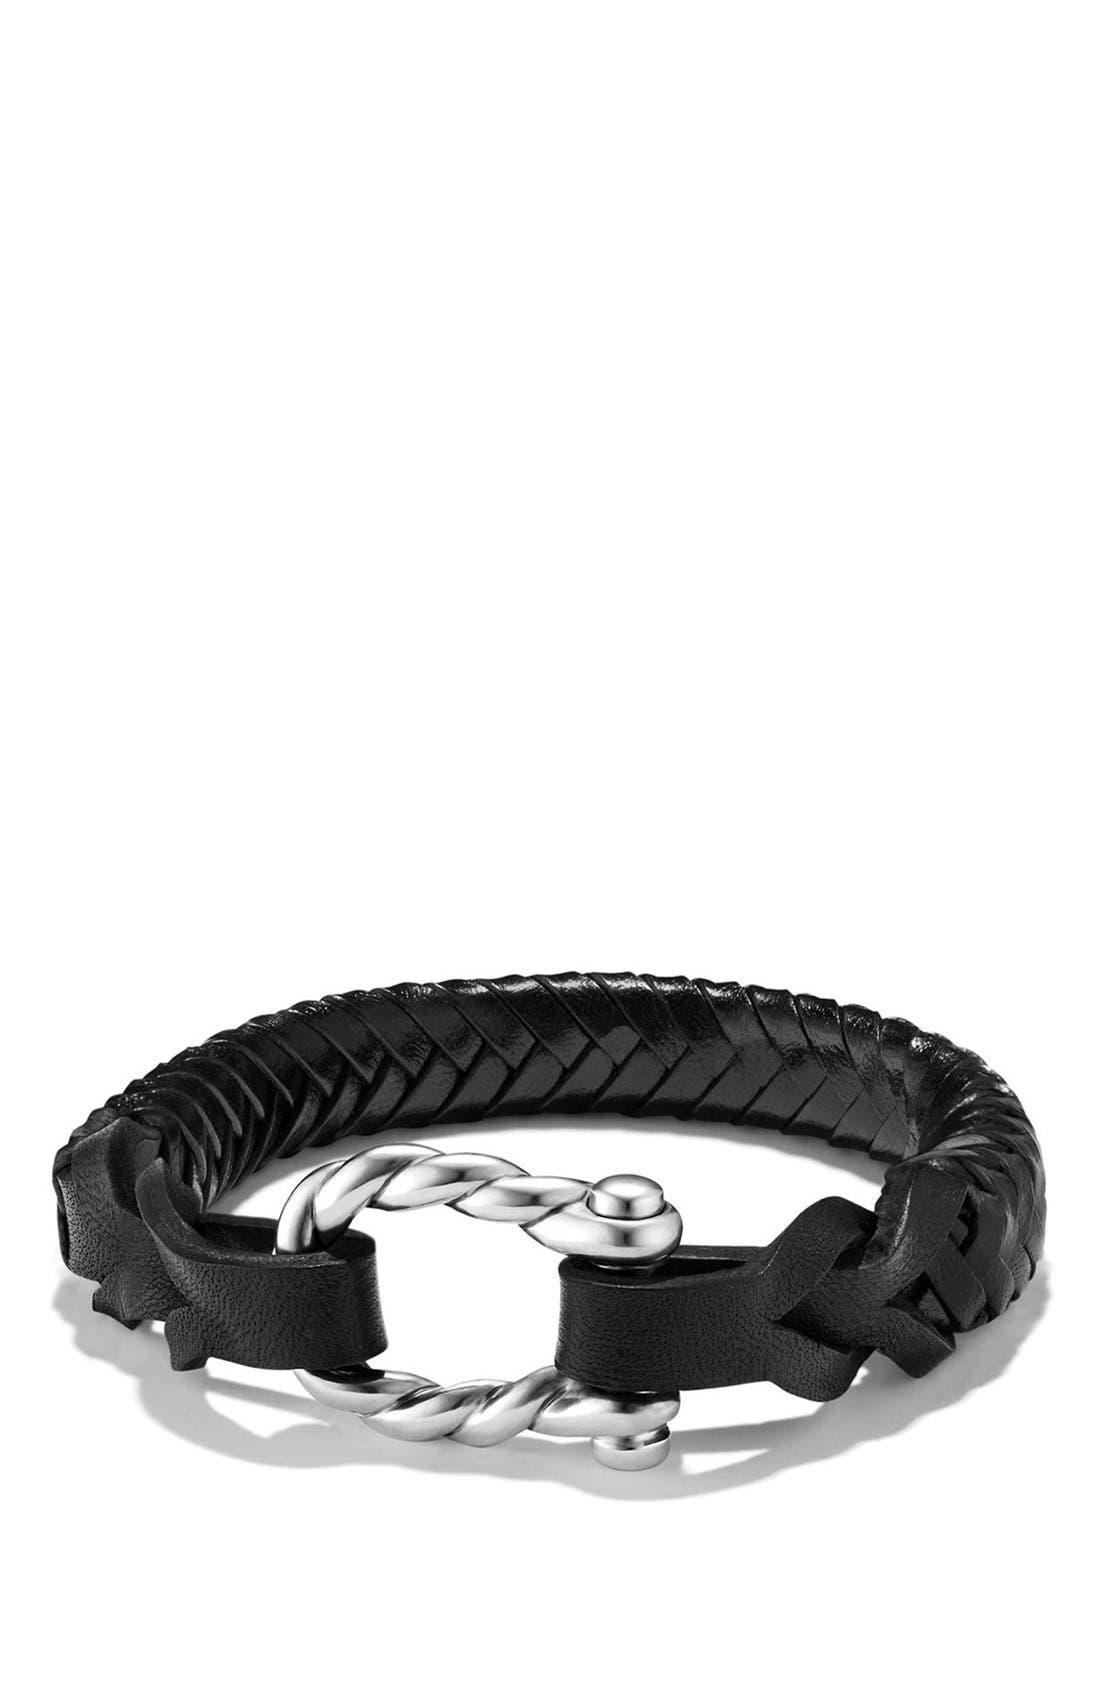 Alternate Image 1 Selected - David Yurman 'Maritime' Leather Woven Shackle Bracelet